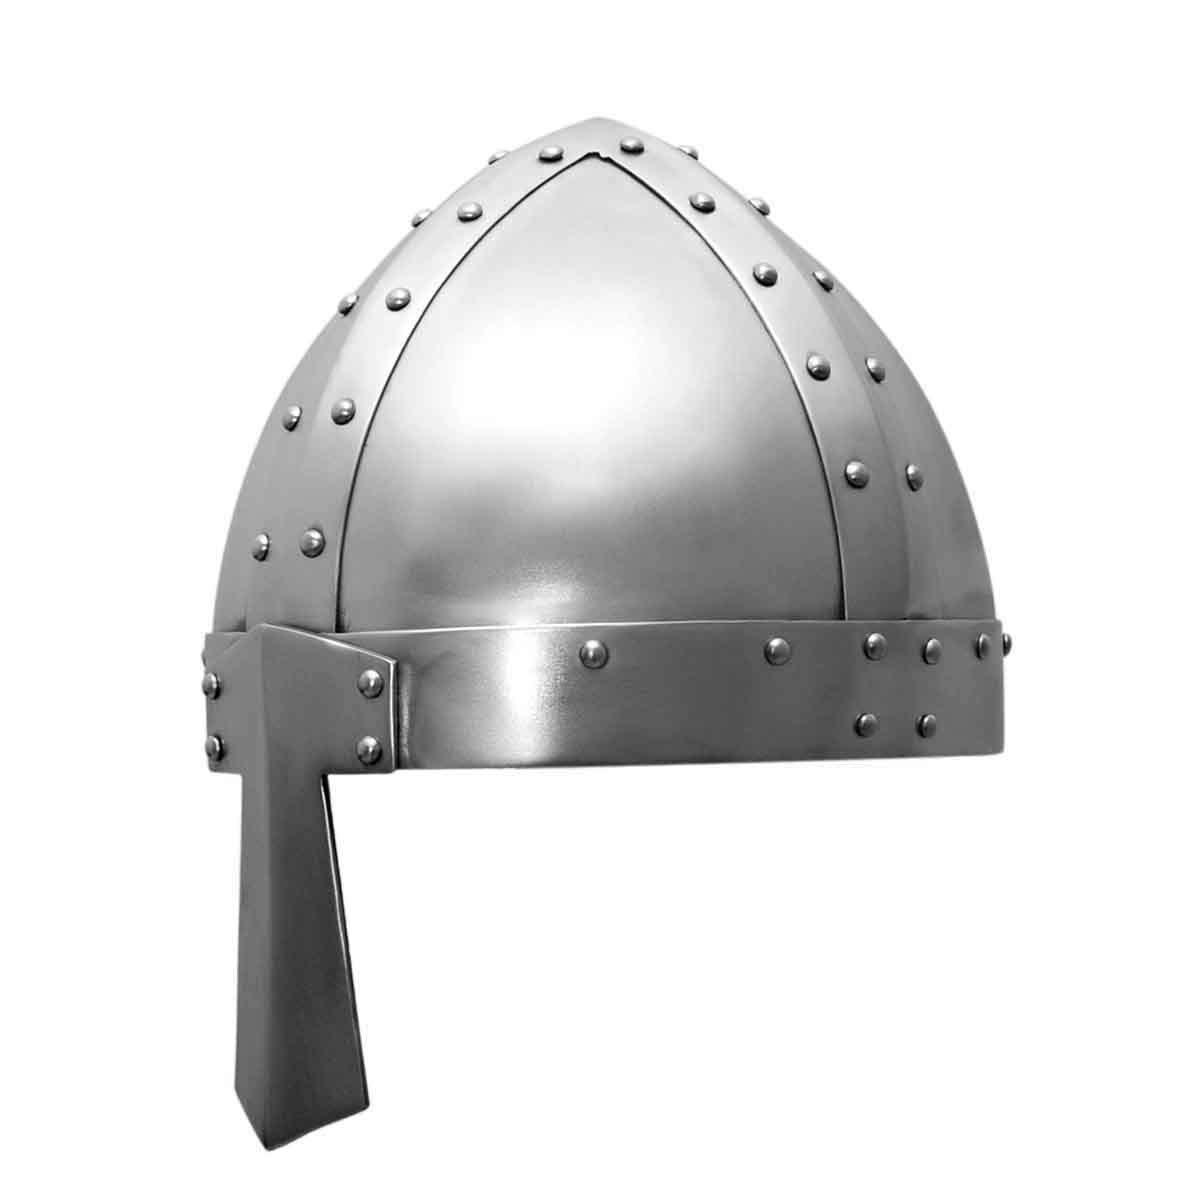 Reenactment Spangenhelm 1 Role-Play LARP Medieval Viking Nasal Helmet theater Fancy Dress